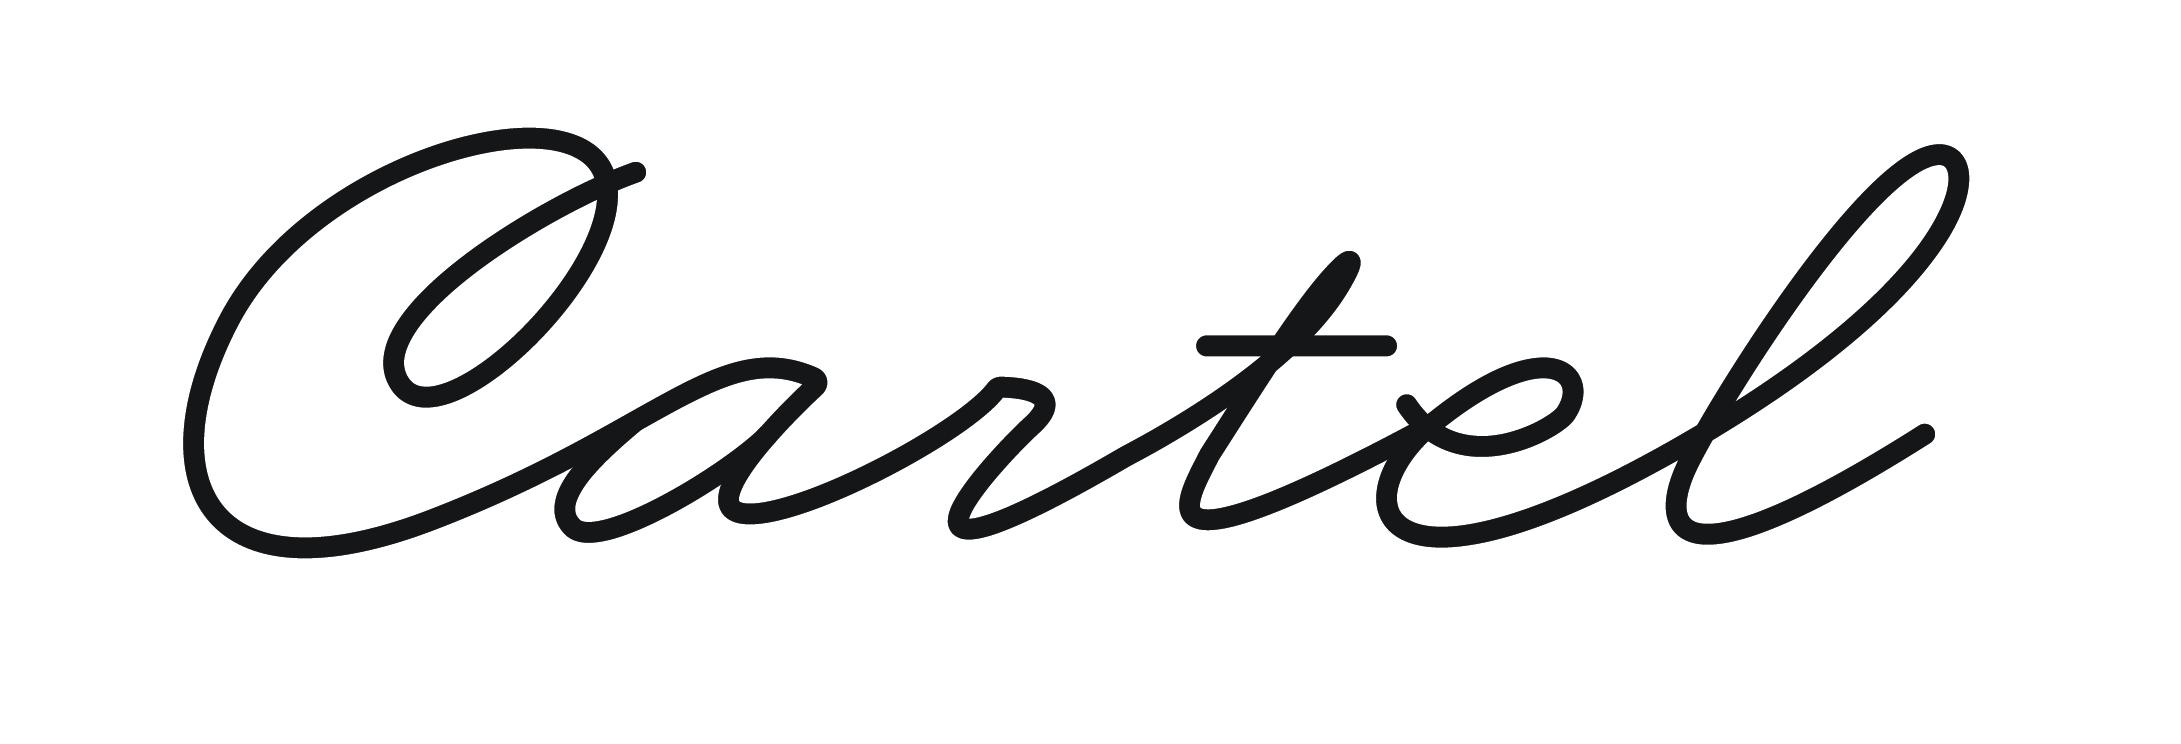 CARTEL_Final_Logo.jpg